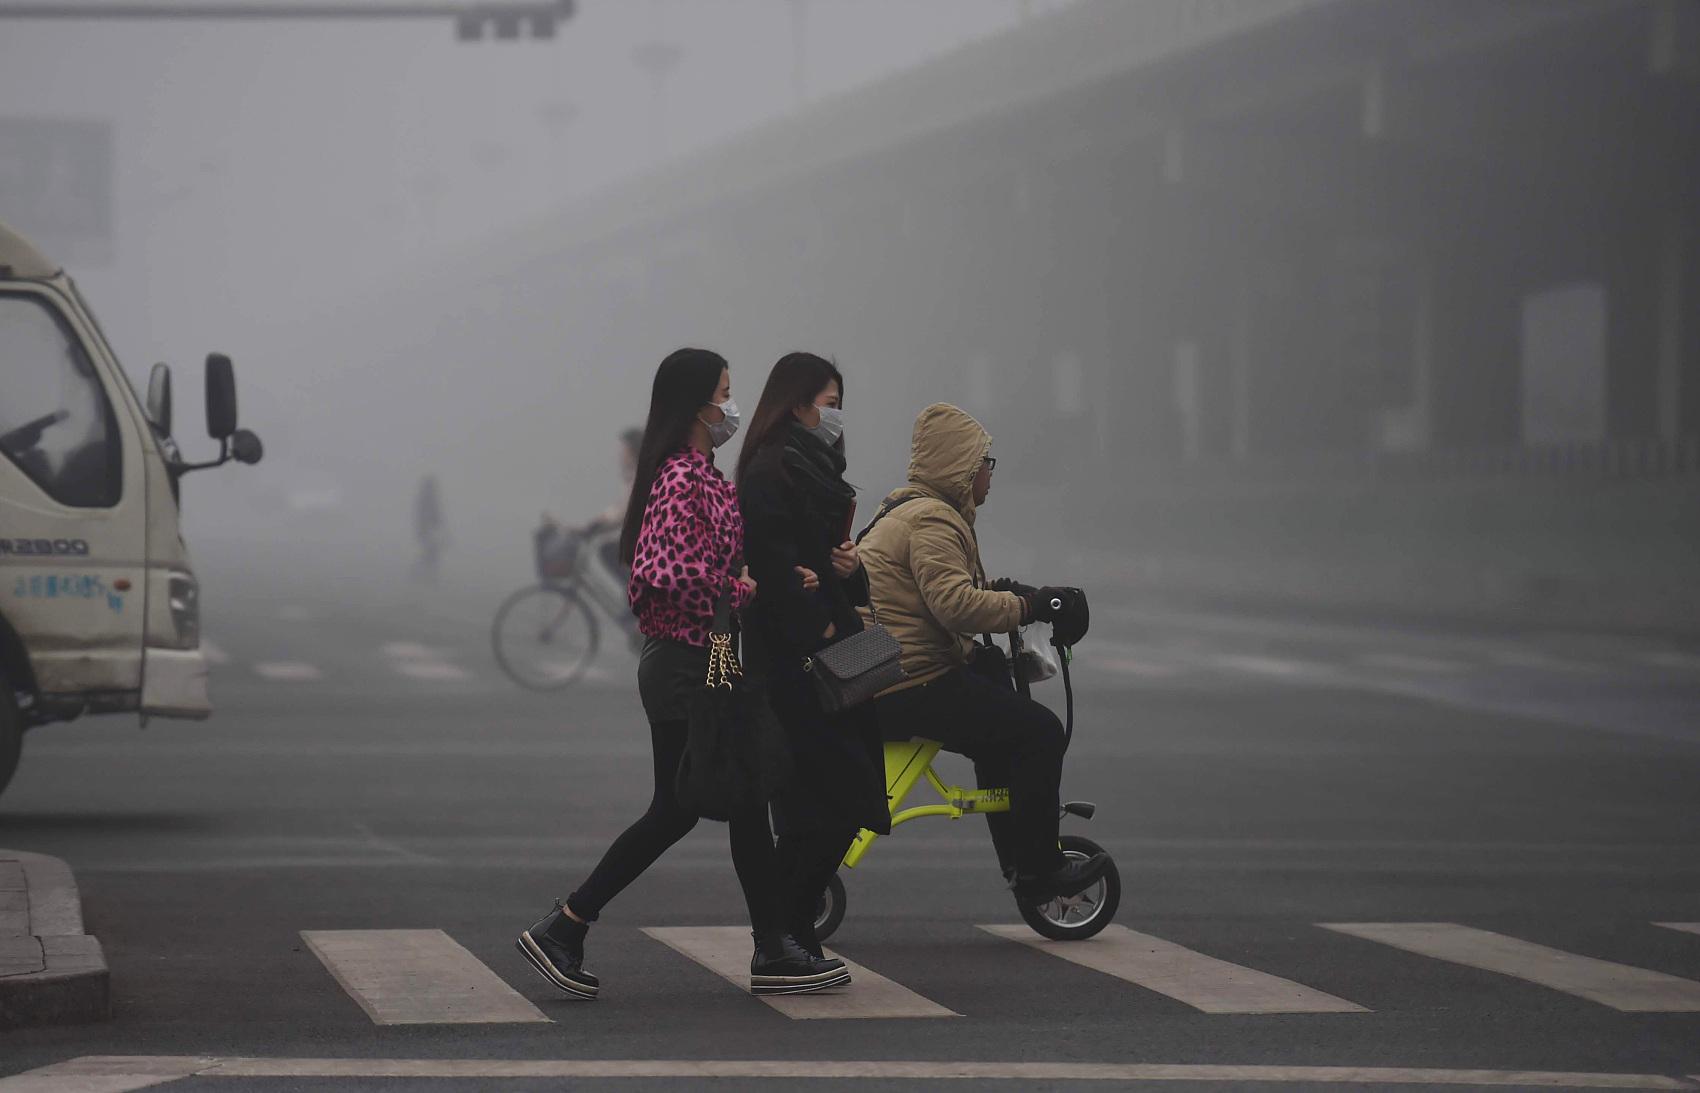 Hebei says air quality goal achieved, despite poor figures in region